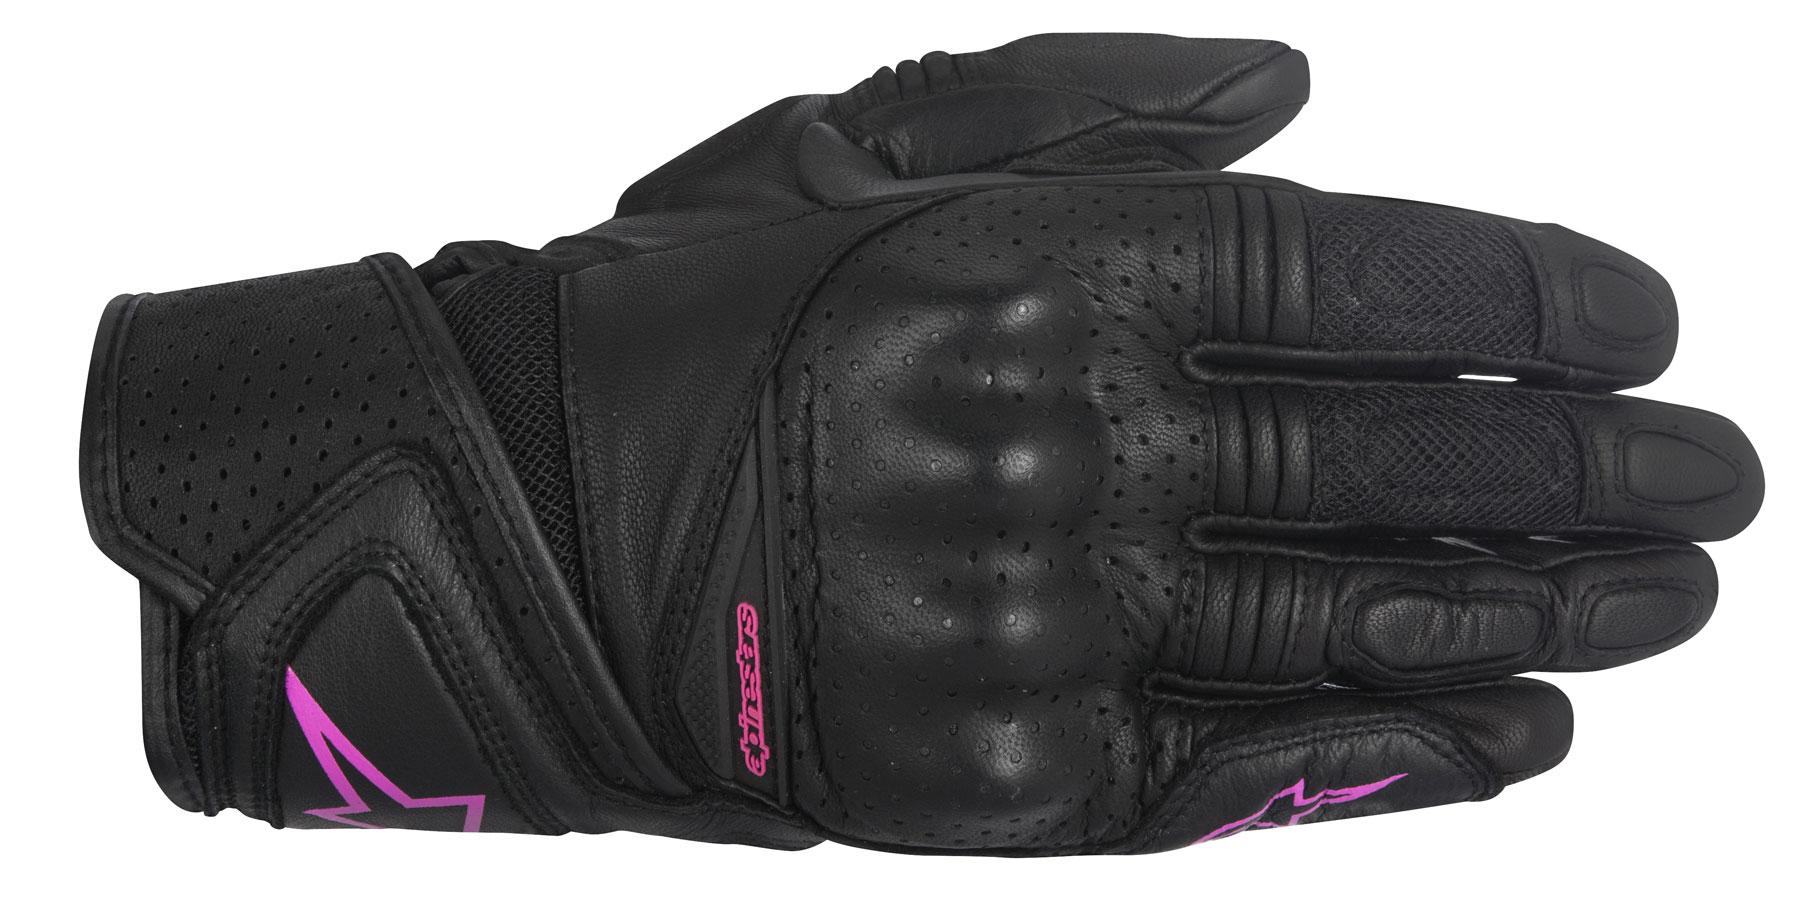 Alpinestars Stella BAIKA Leather/Mesh Gloves (Black/Pink)